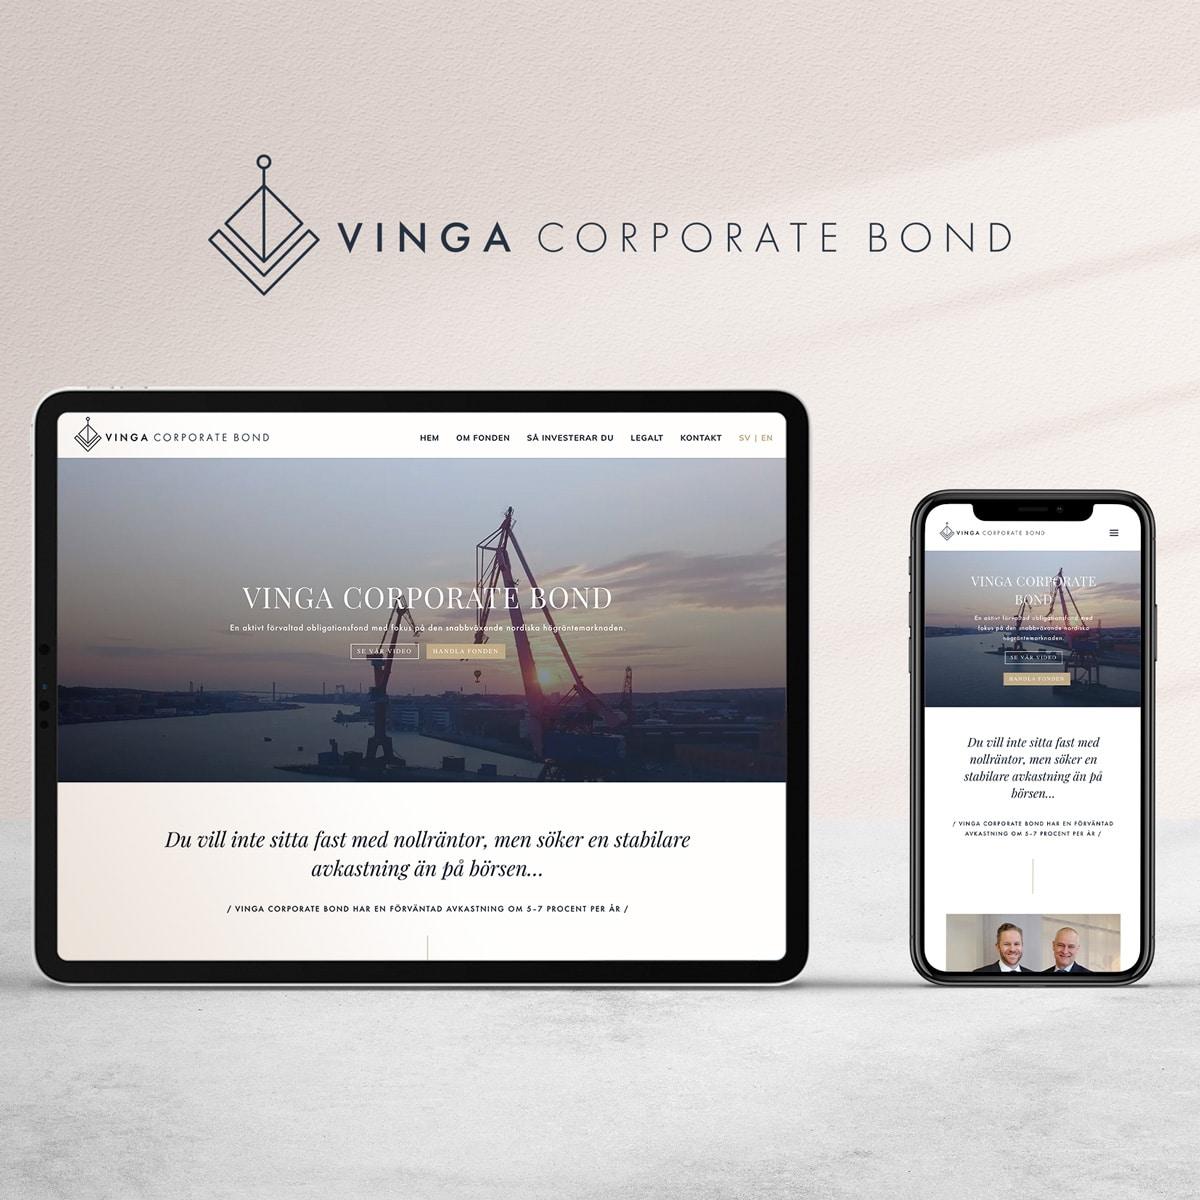 vinga corporate bond design ipad webb mobil mockup